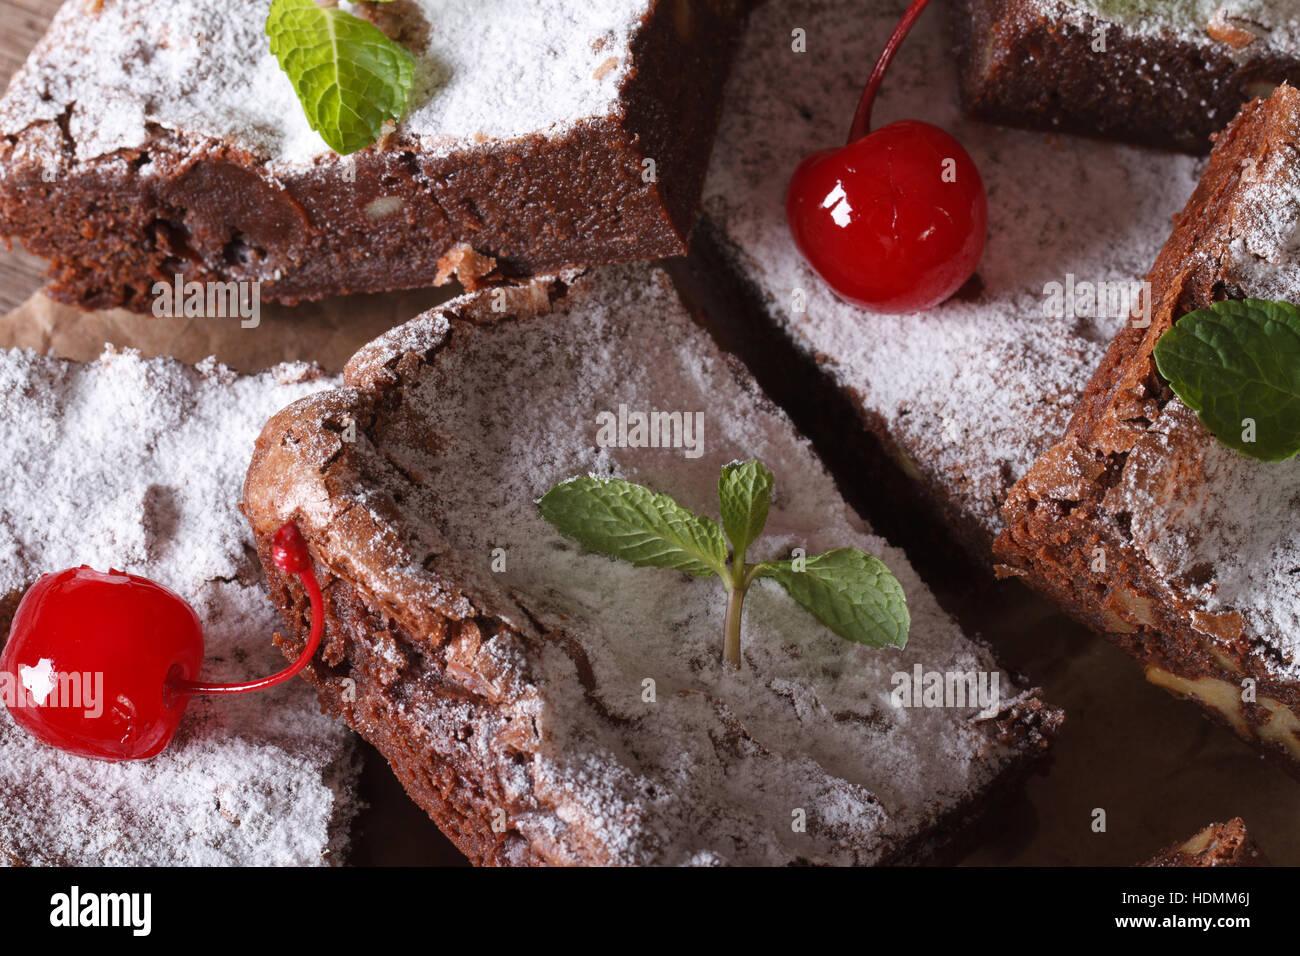 chocolate cake brownies with mint and cherries macro. horizontal - Stock Image